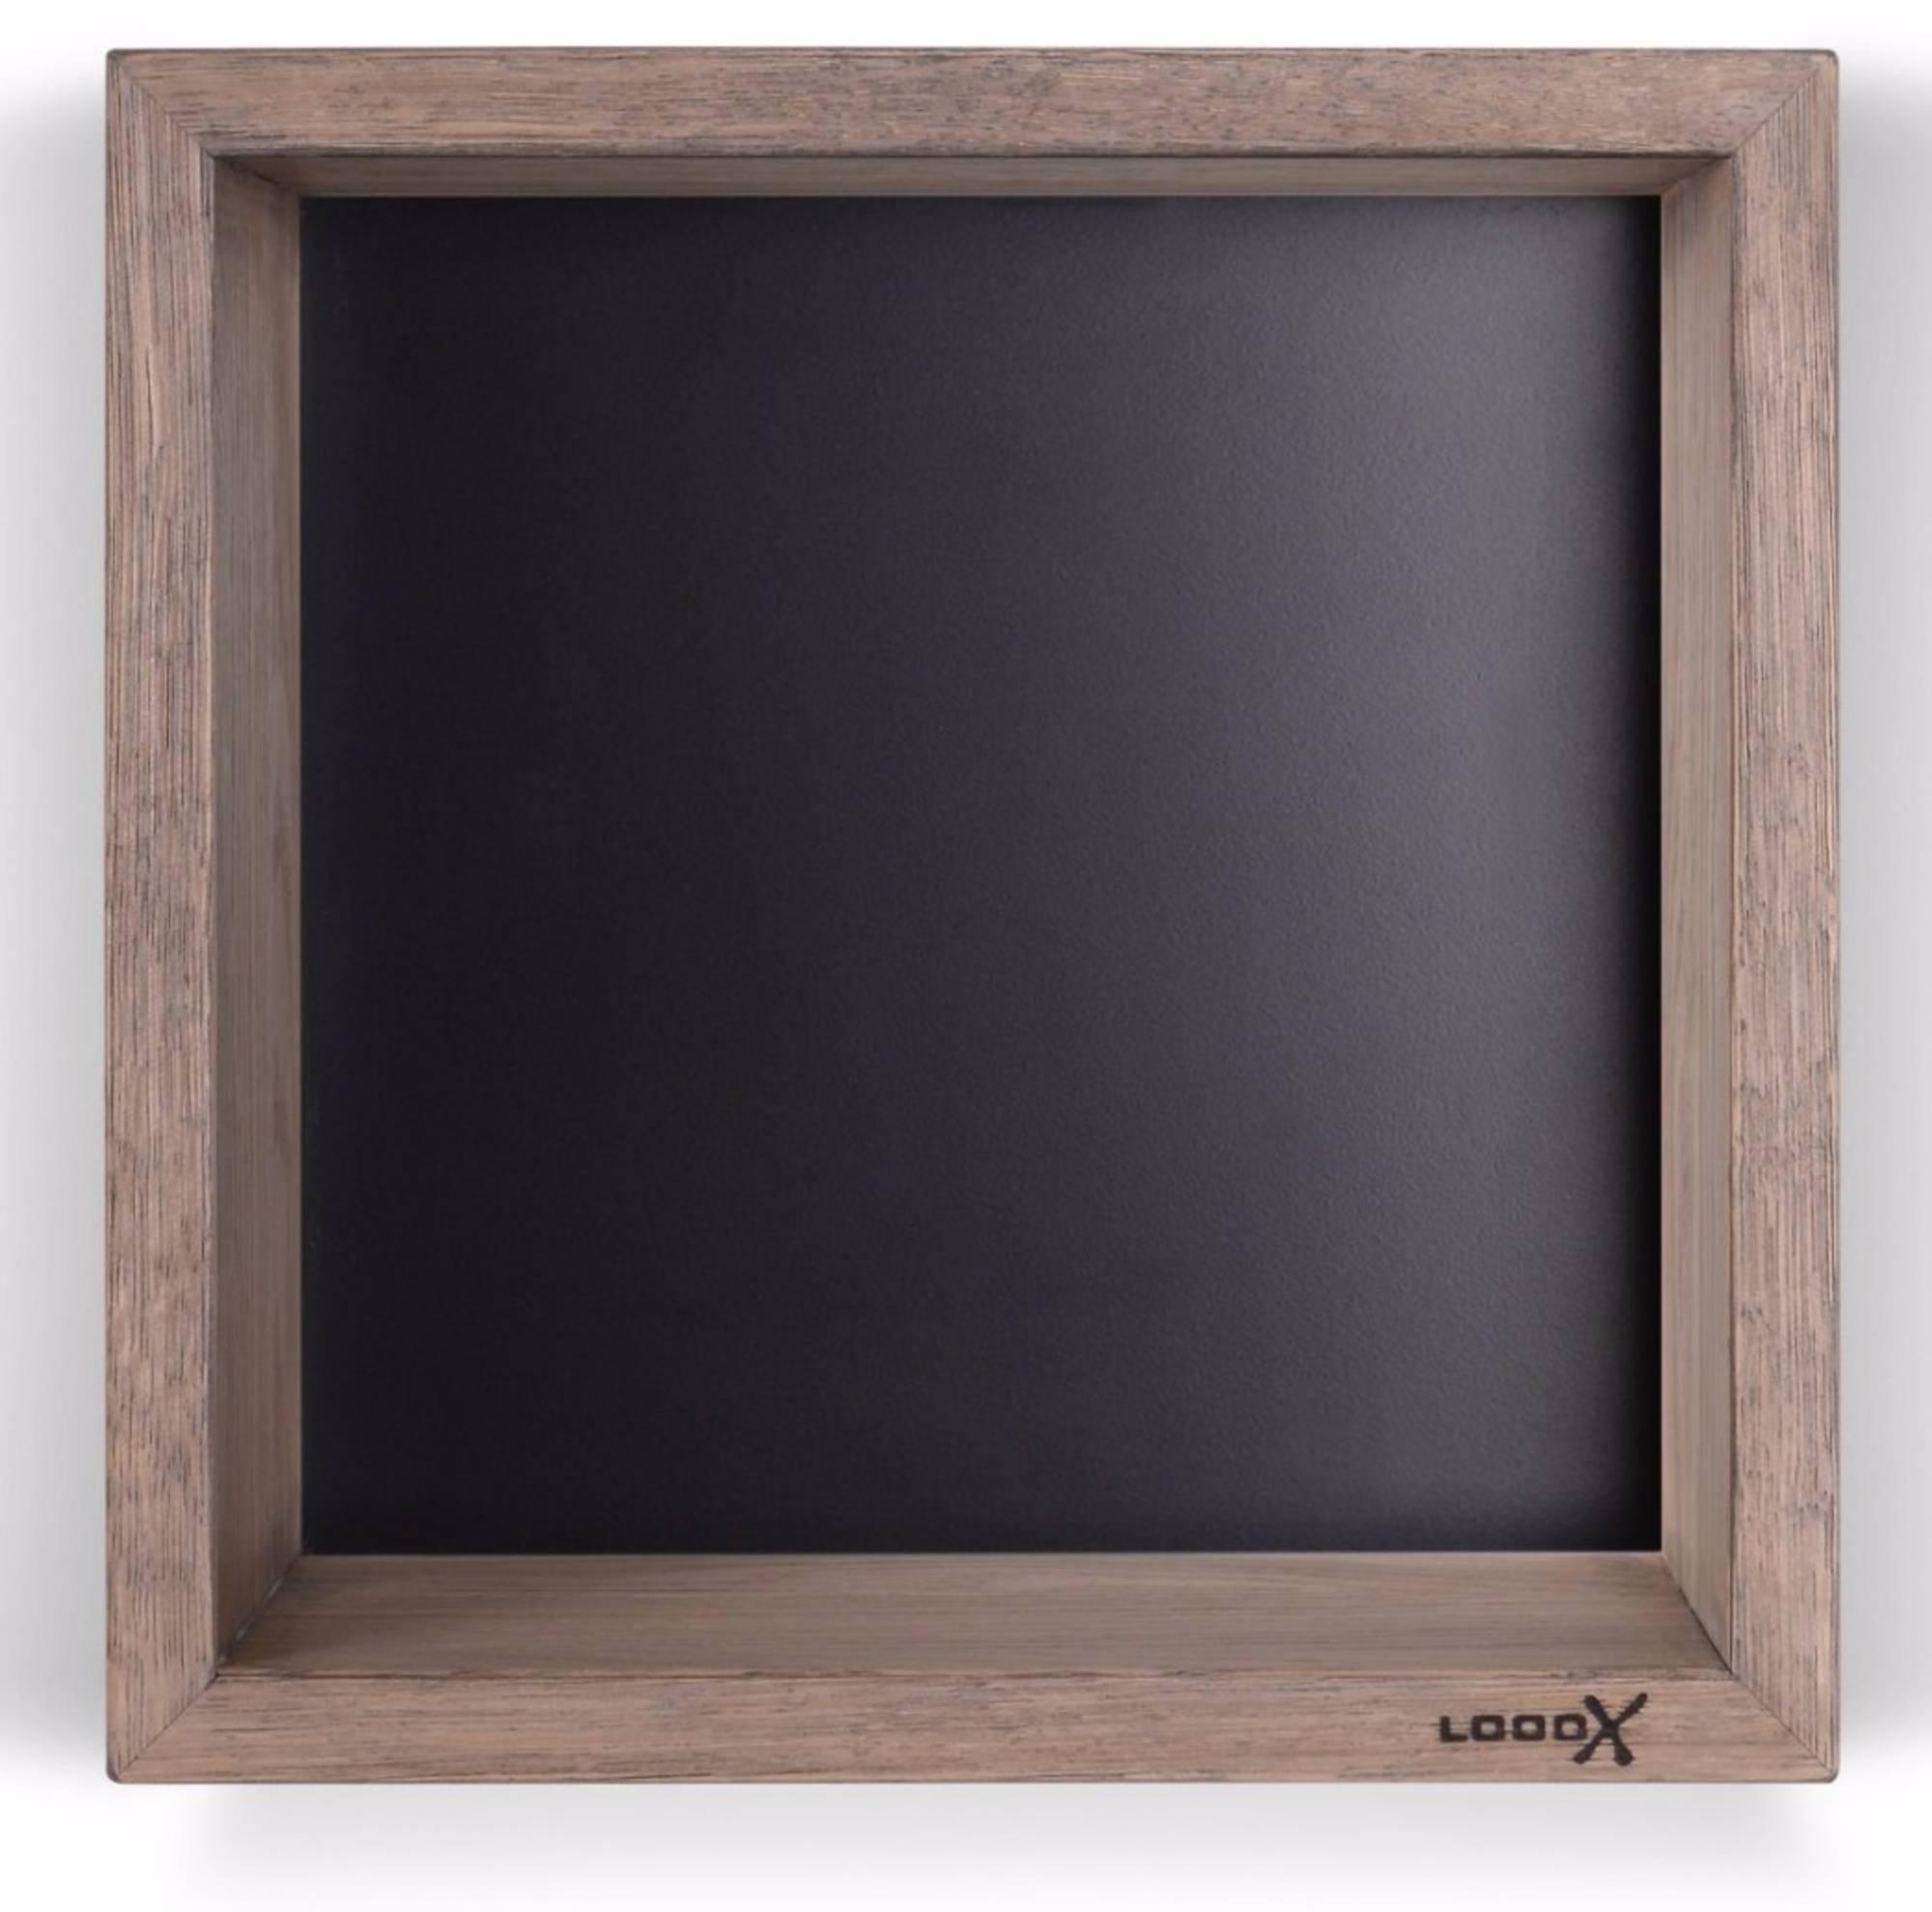 Looox Wood WBOX30MZ